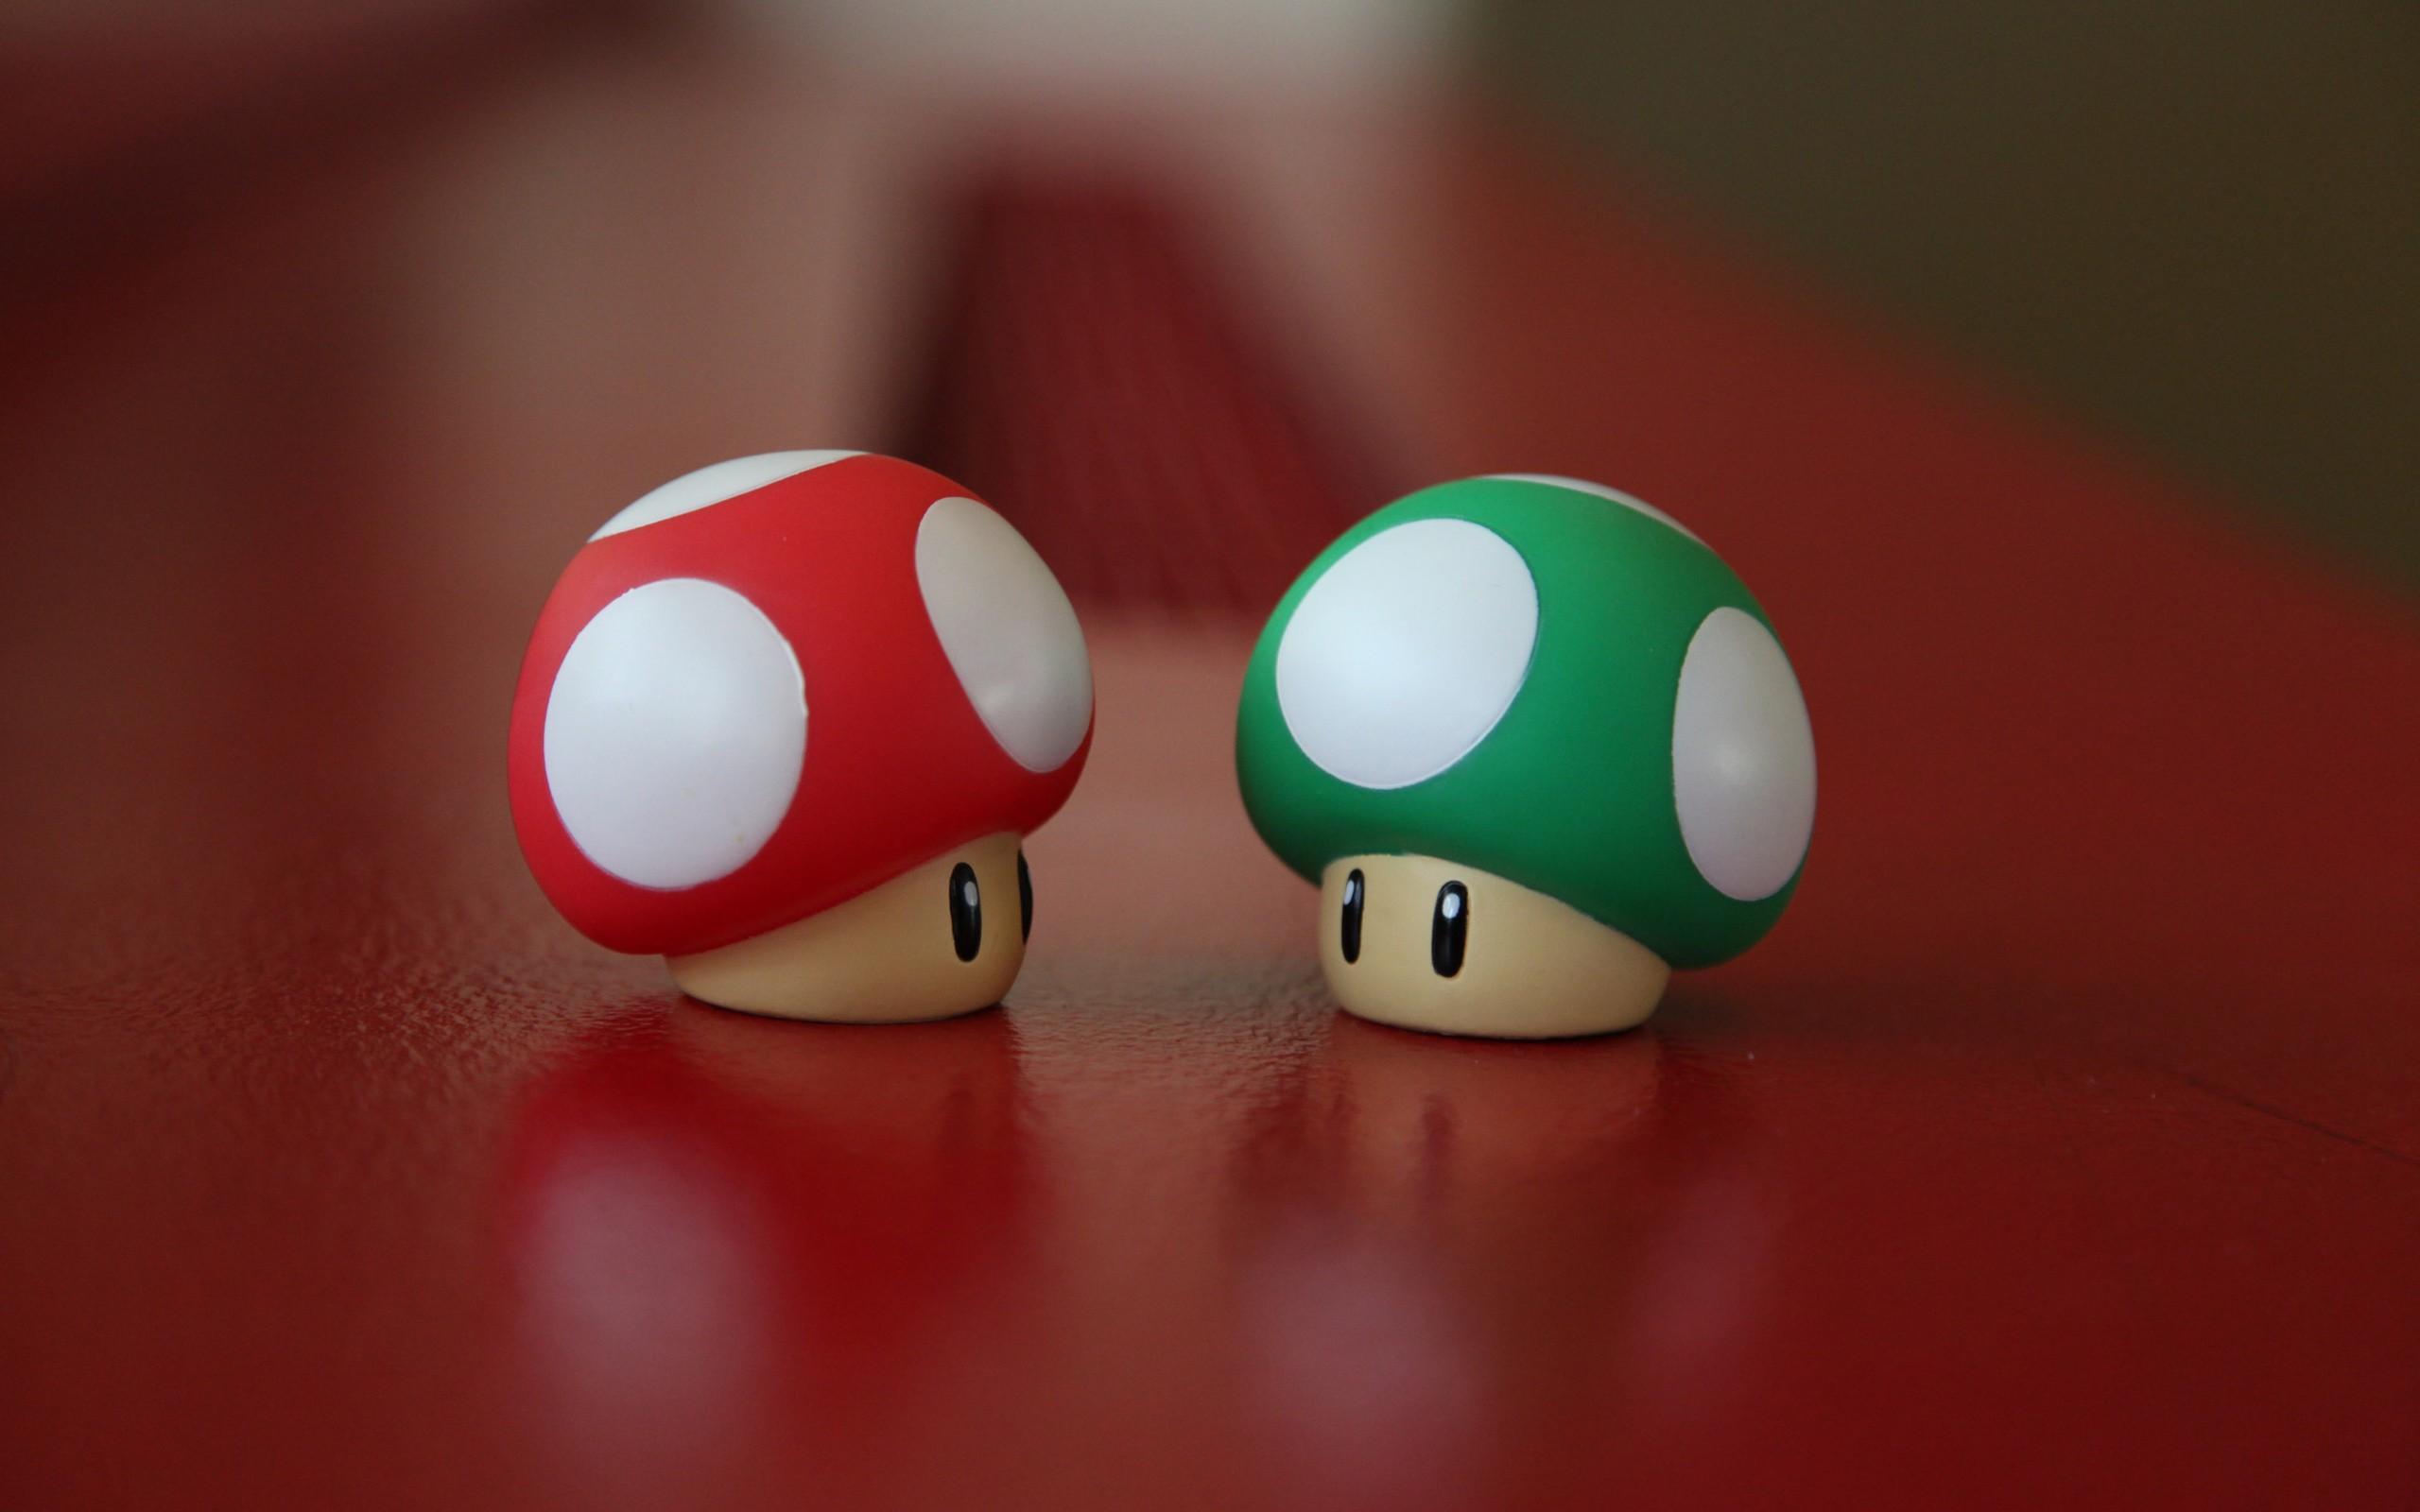 Super Mario 039 S Mushrooms Wallpaper 2560x1600 2378